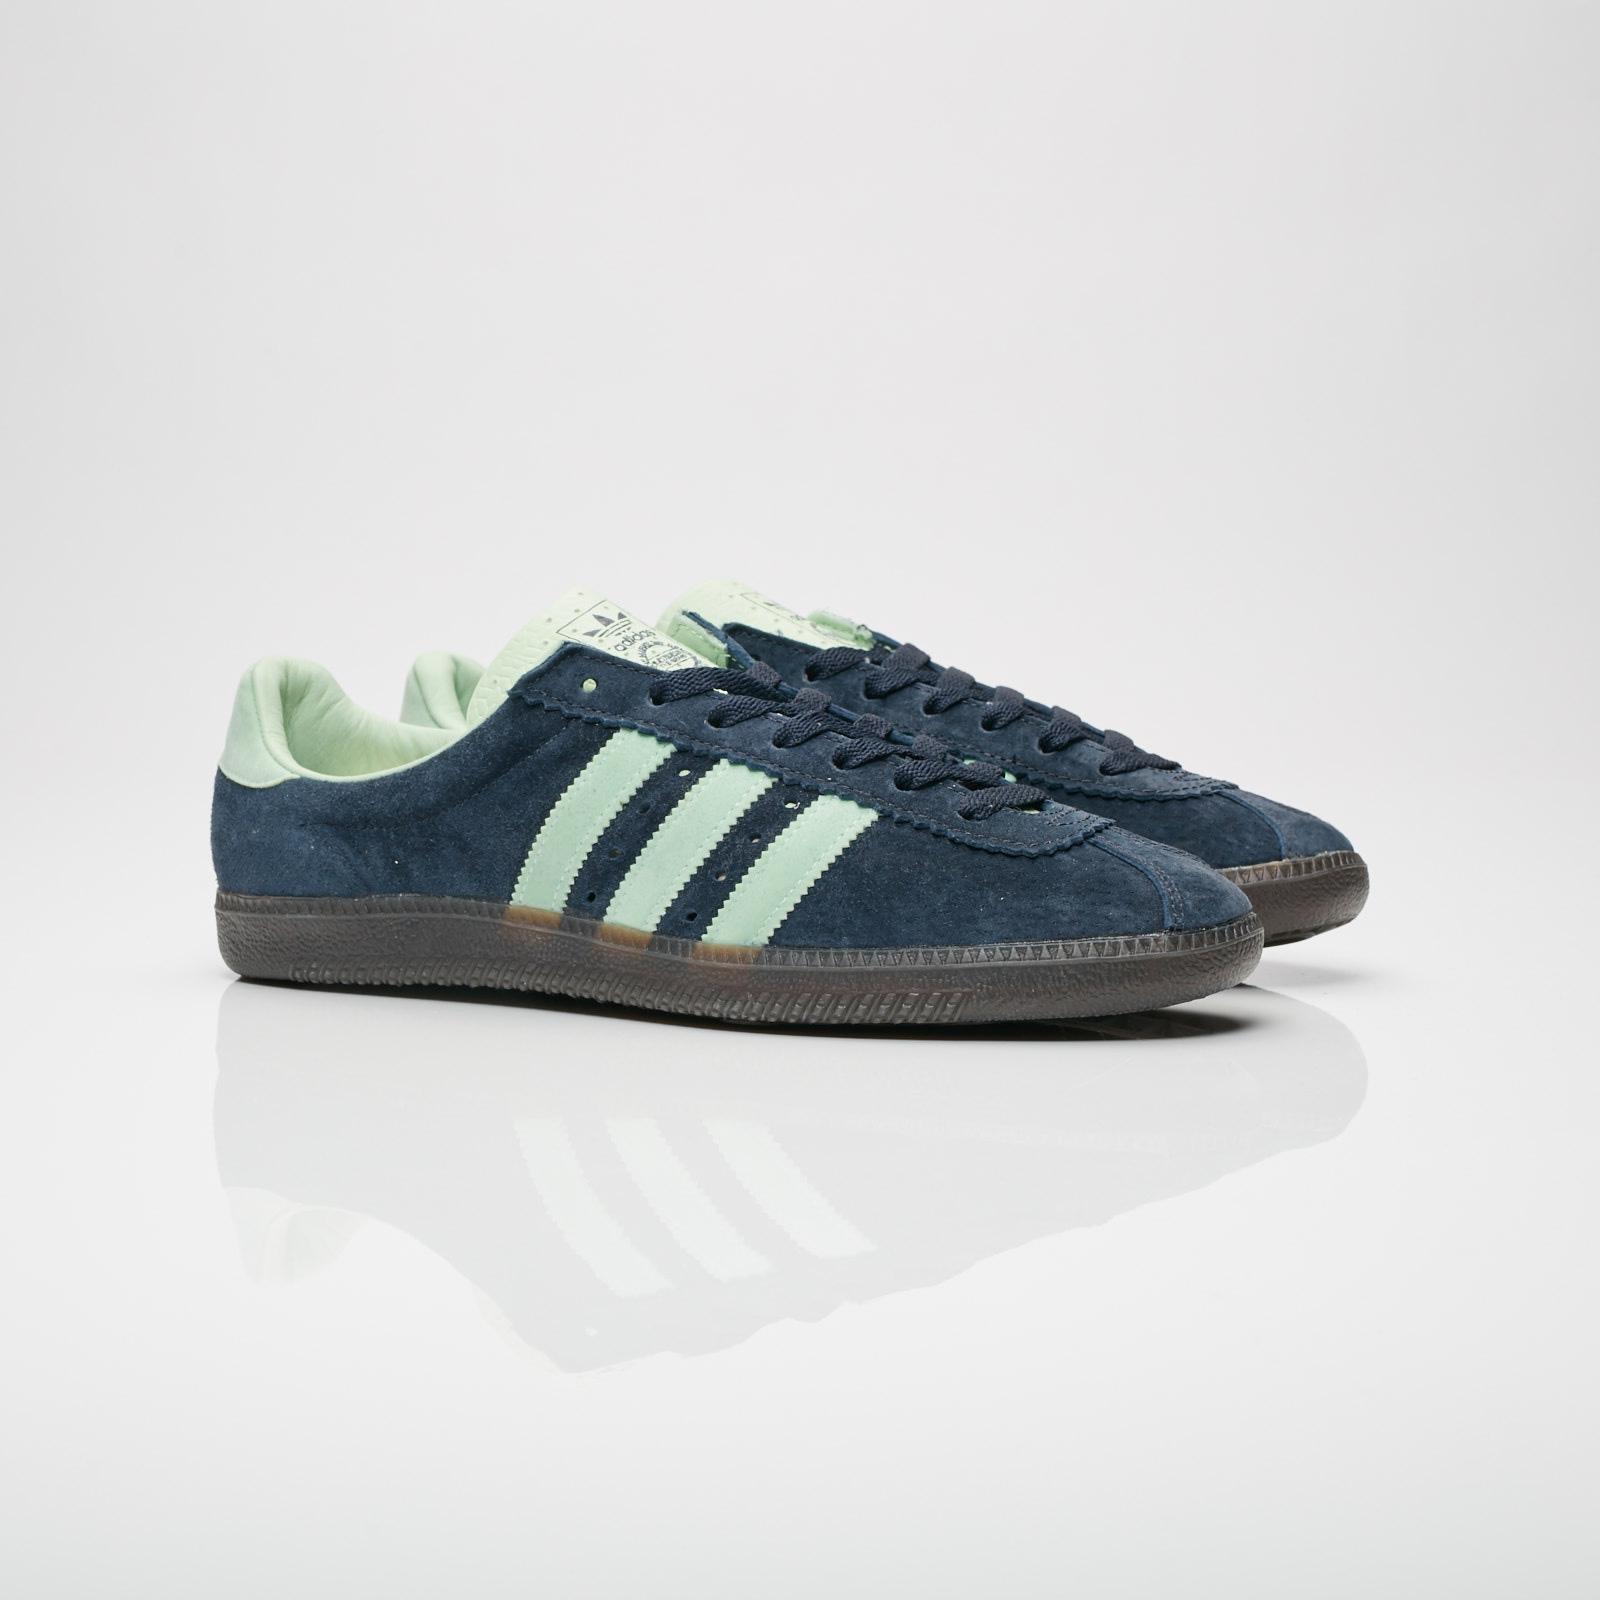 mareado Oponerse a Rayo  adidas Padiham - Ac7747 - Sneakersnstuff   sneakers & streetwear online  since 1999